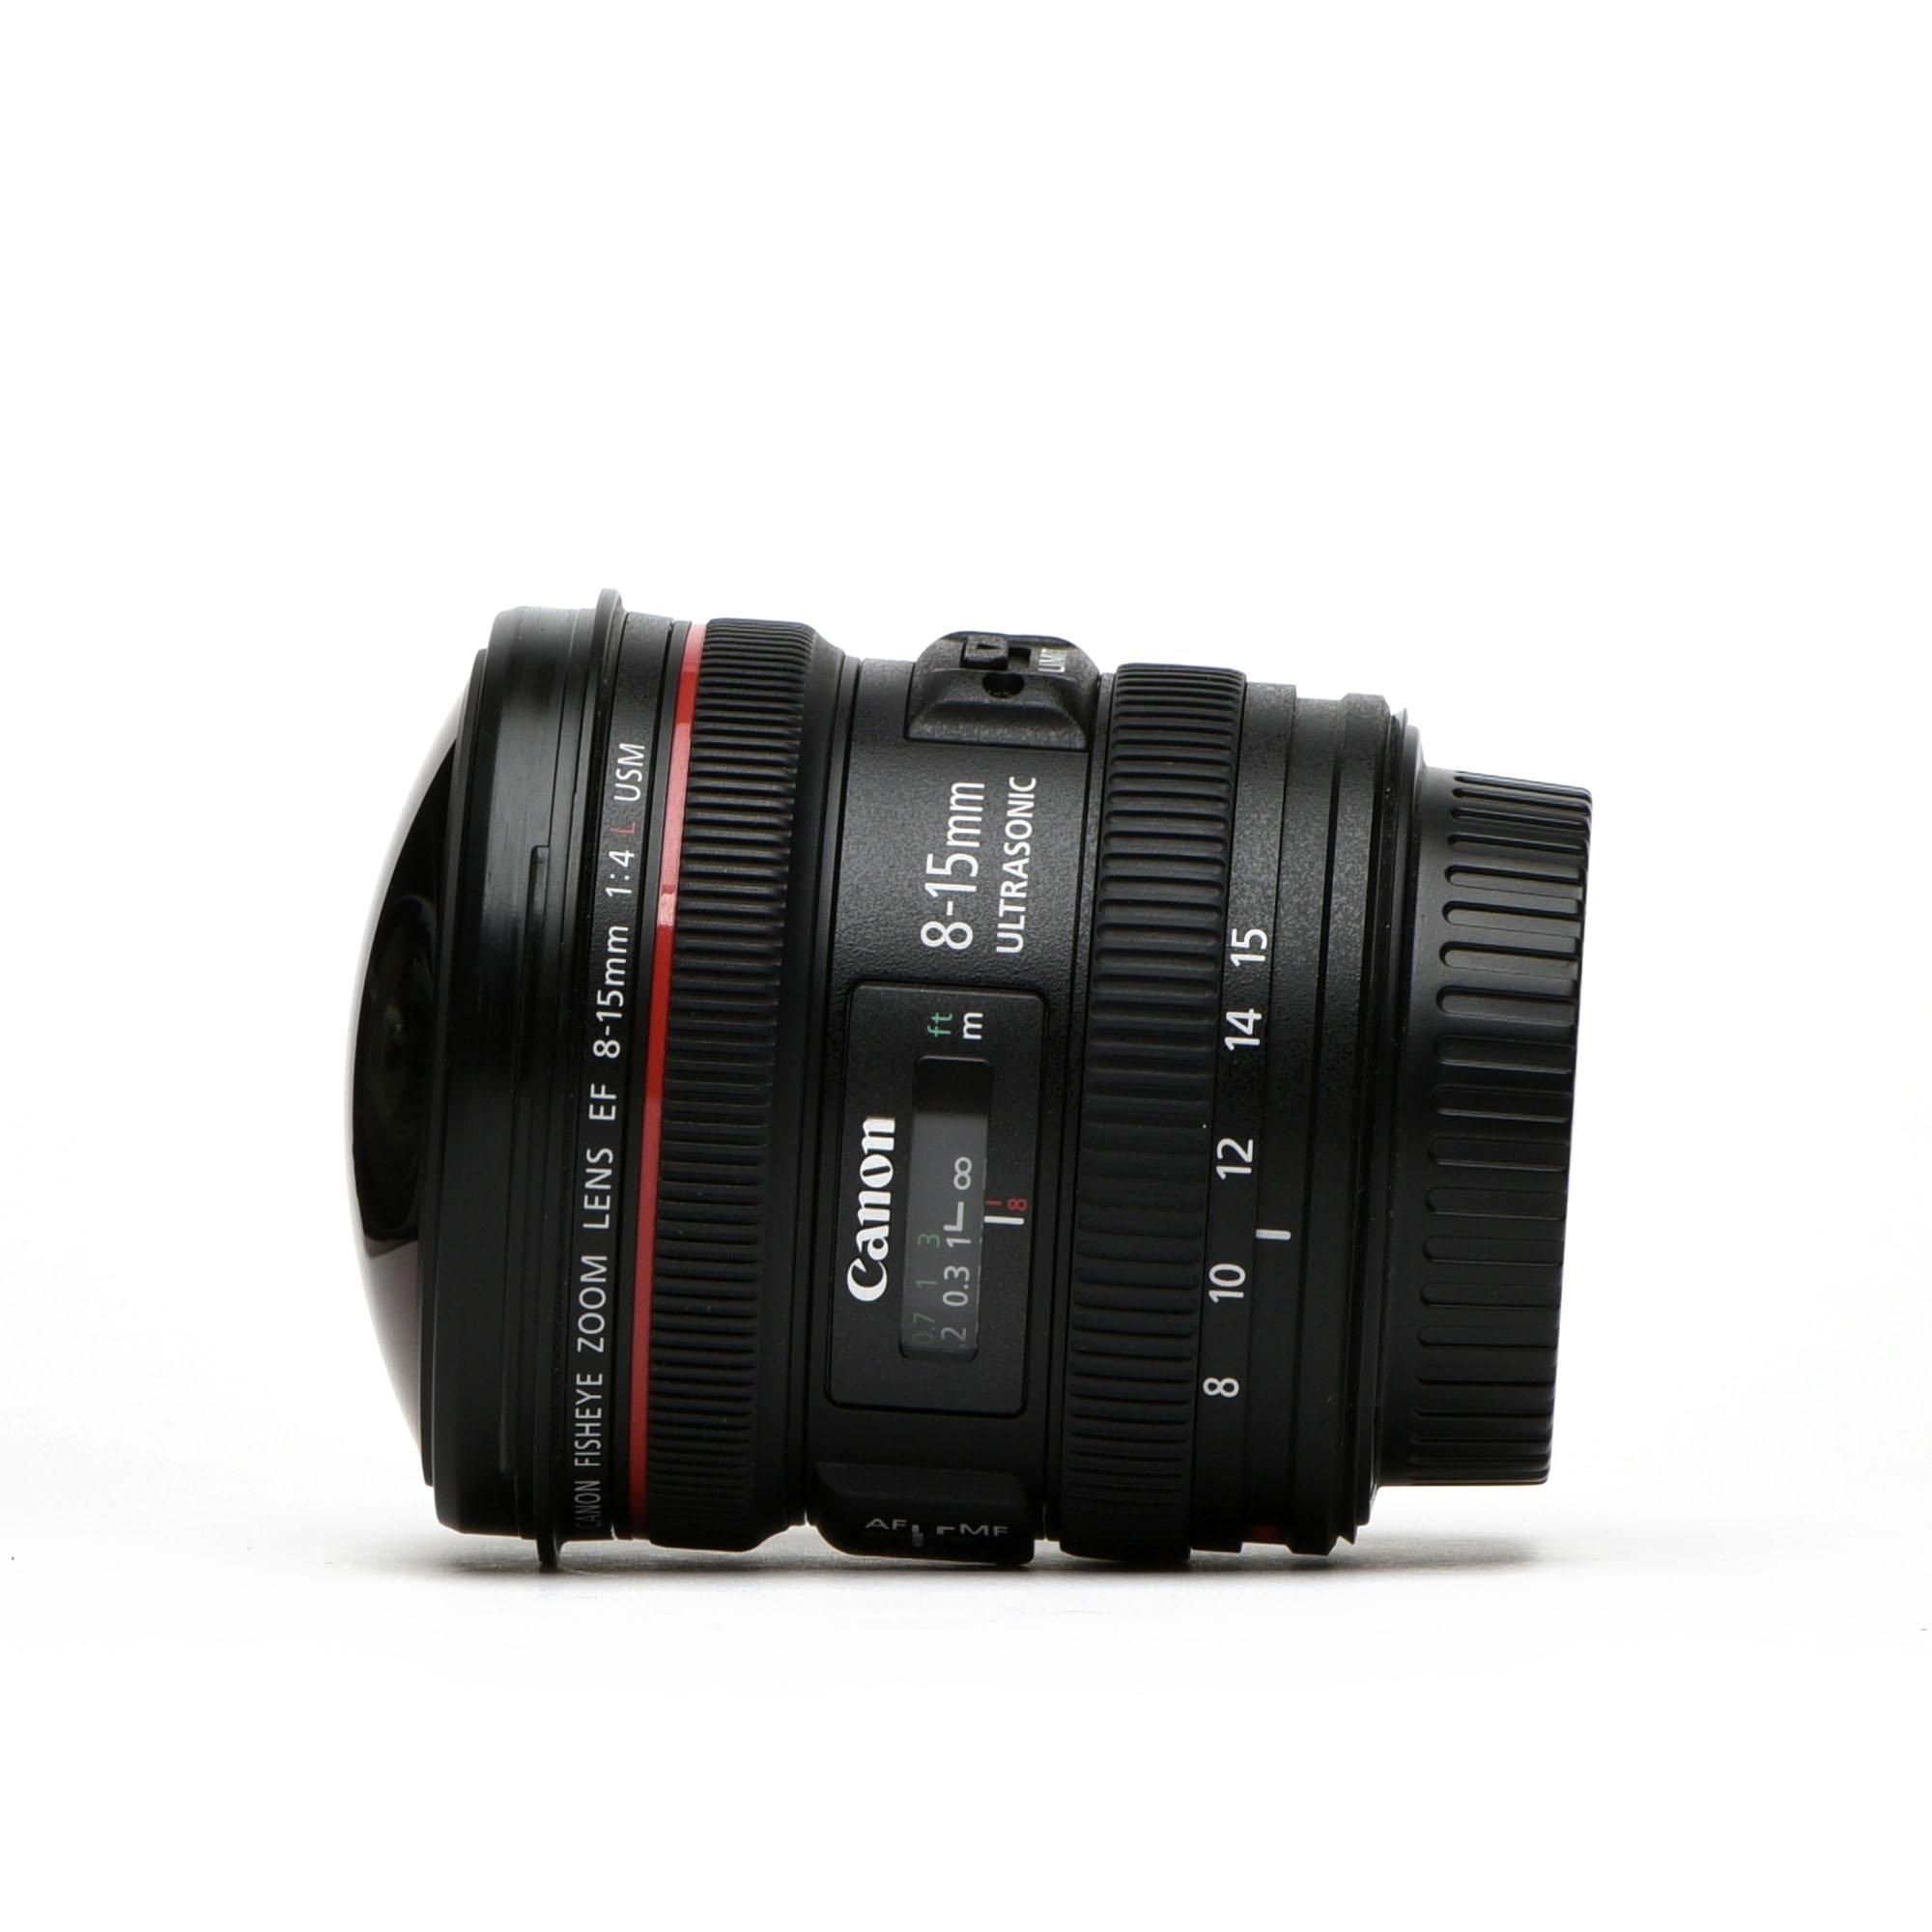 Canon EF 8-15mm f/4L Fisheye USM review